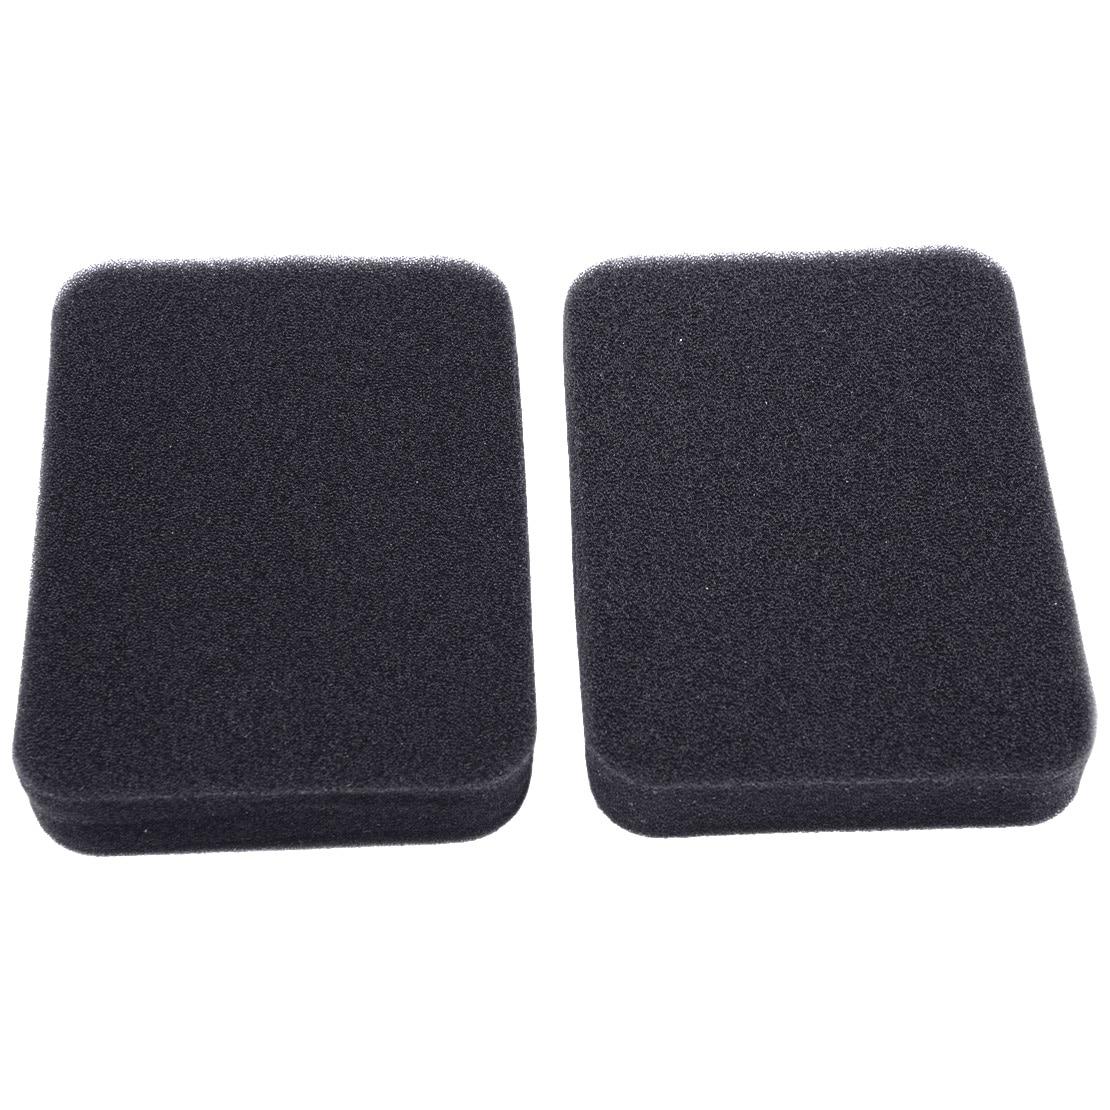 LETAOSK 2pcs Foam Air Filter Fit For Honda GX240 GX270 GX340 GX390 17211-899-000 Replacement Power Tools Accessories